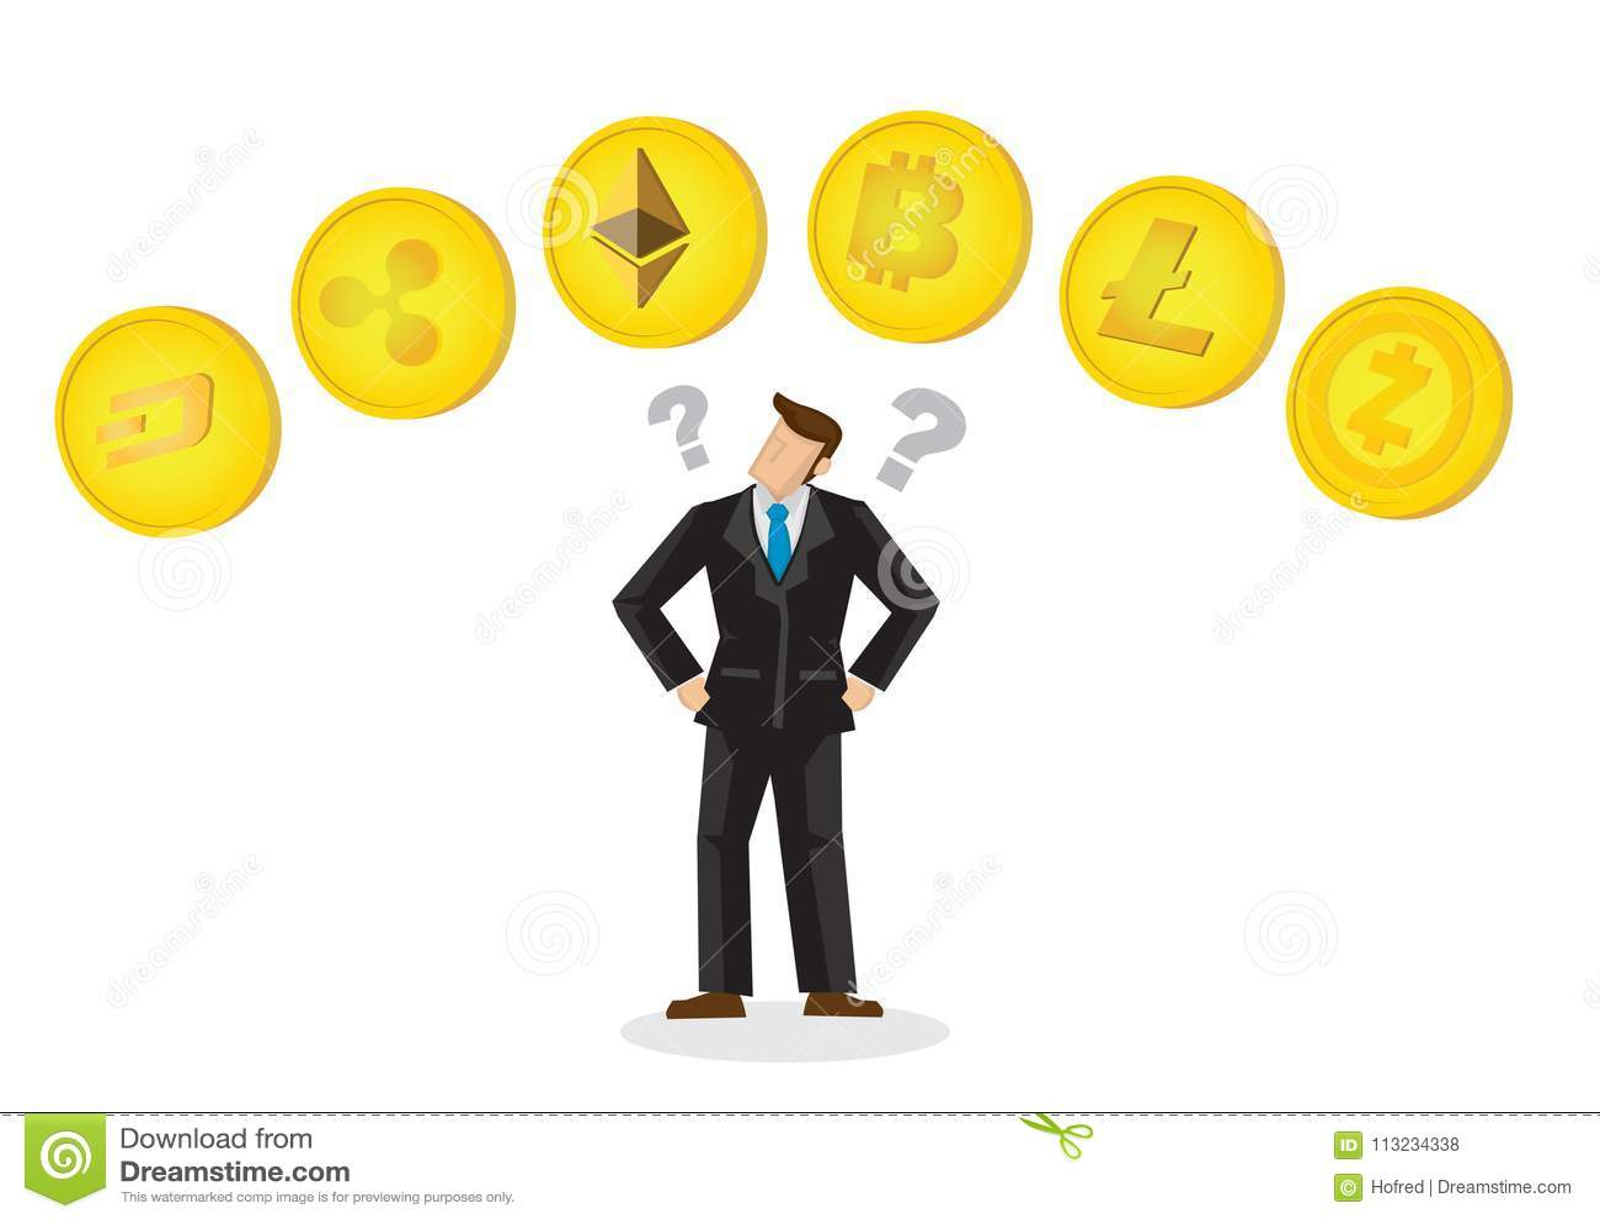 cryptocurrency marketcapital investing.com